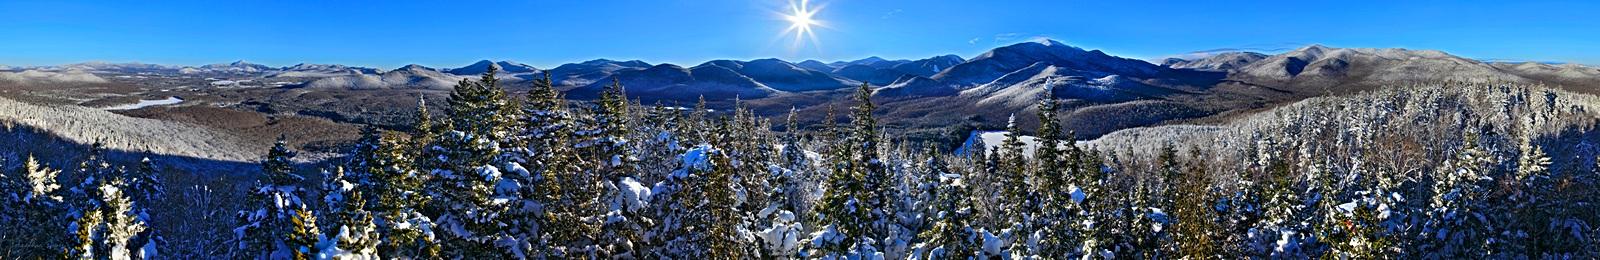 360 degree,treetop,Mt Jo,Heart Lake,winter,High Peaks,Adirondack Mountains,360 degree treetop,Johnathan Esper,Adirondacks,High Peaks,range,mountains,, photo